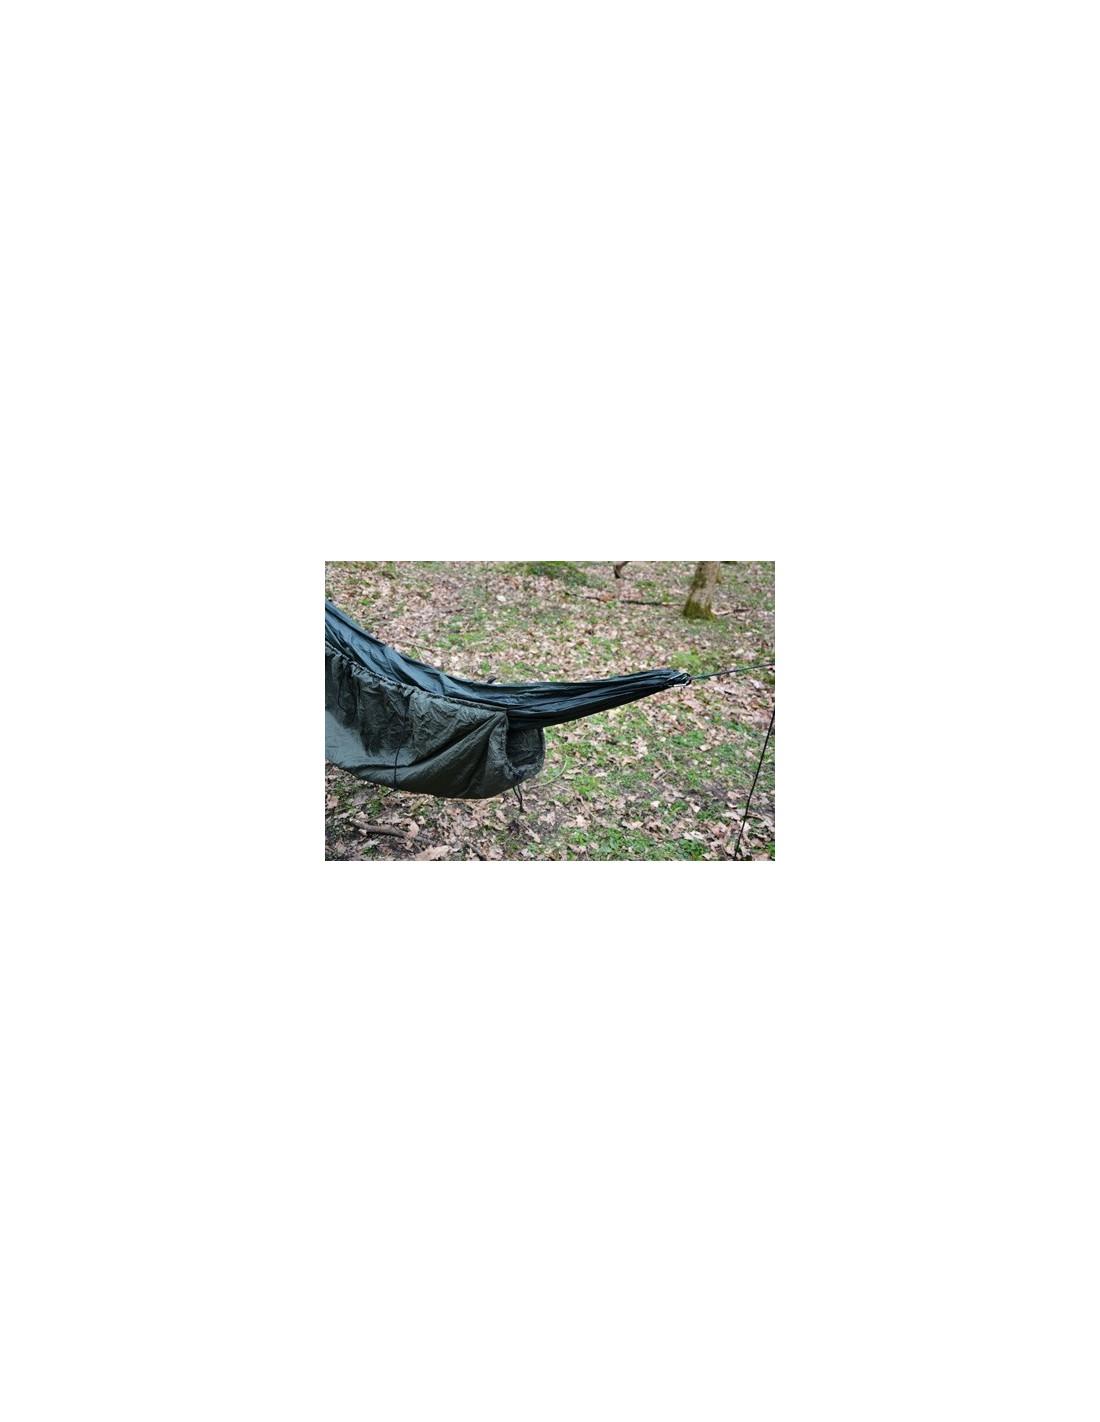 dd hammock underblanket   funda de abrigo aislante para hamacas hammock underblanket   funda de abrigo aislante para hamacas  rh   paratum es